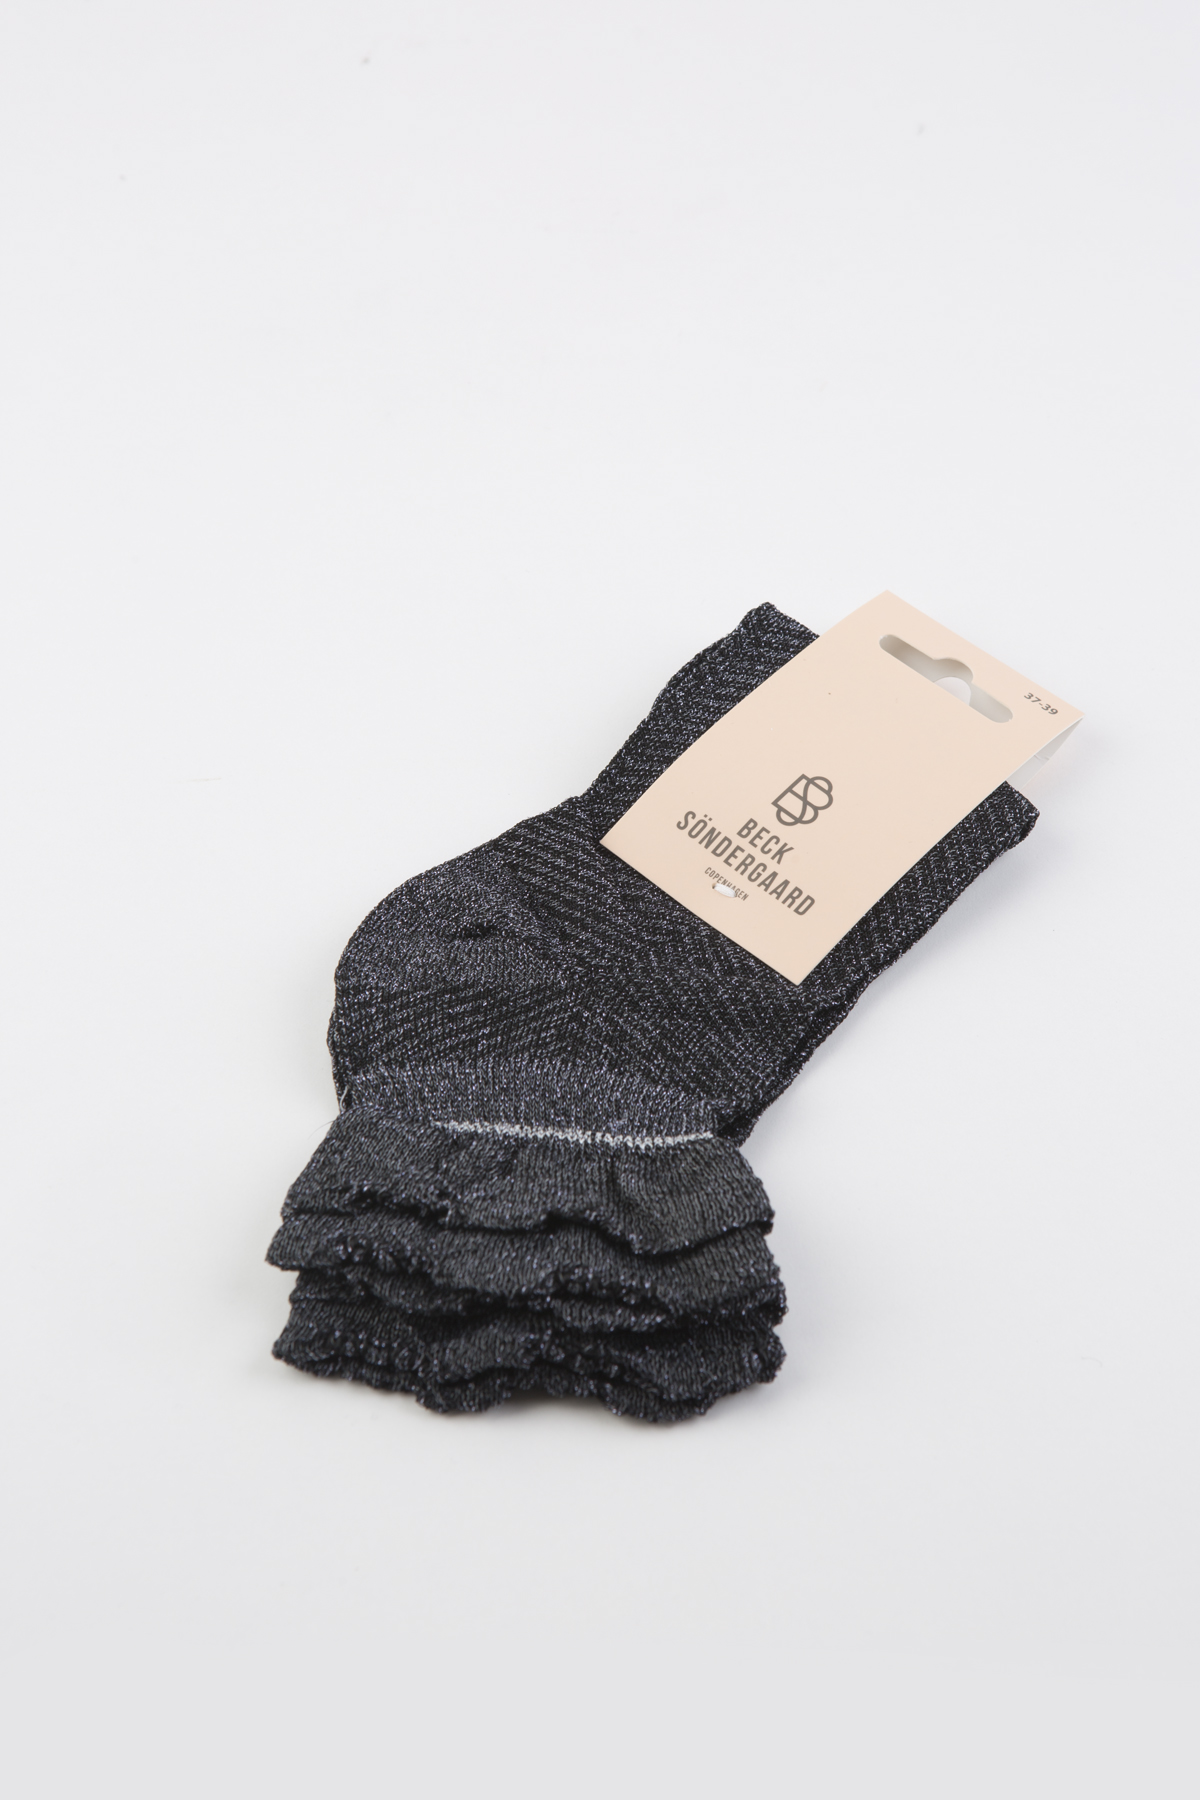 dollie-grey-sky-frills-glitter-socks-becksondergaard-matchboxathens